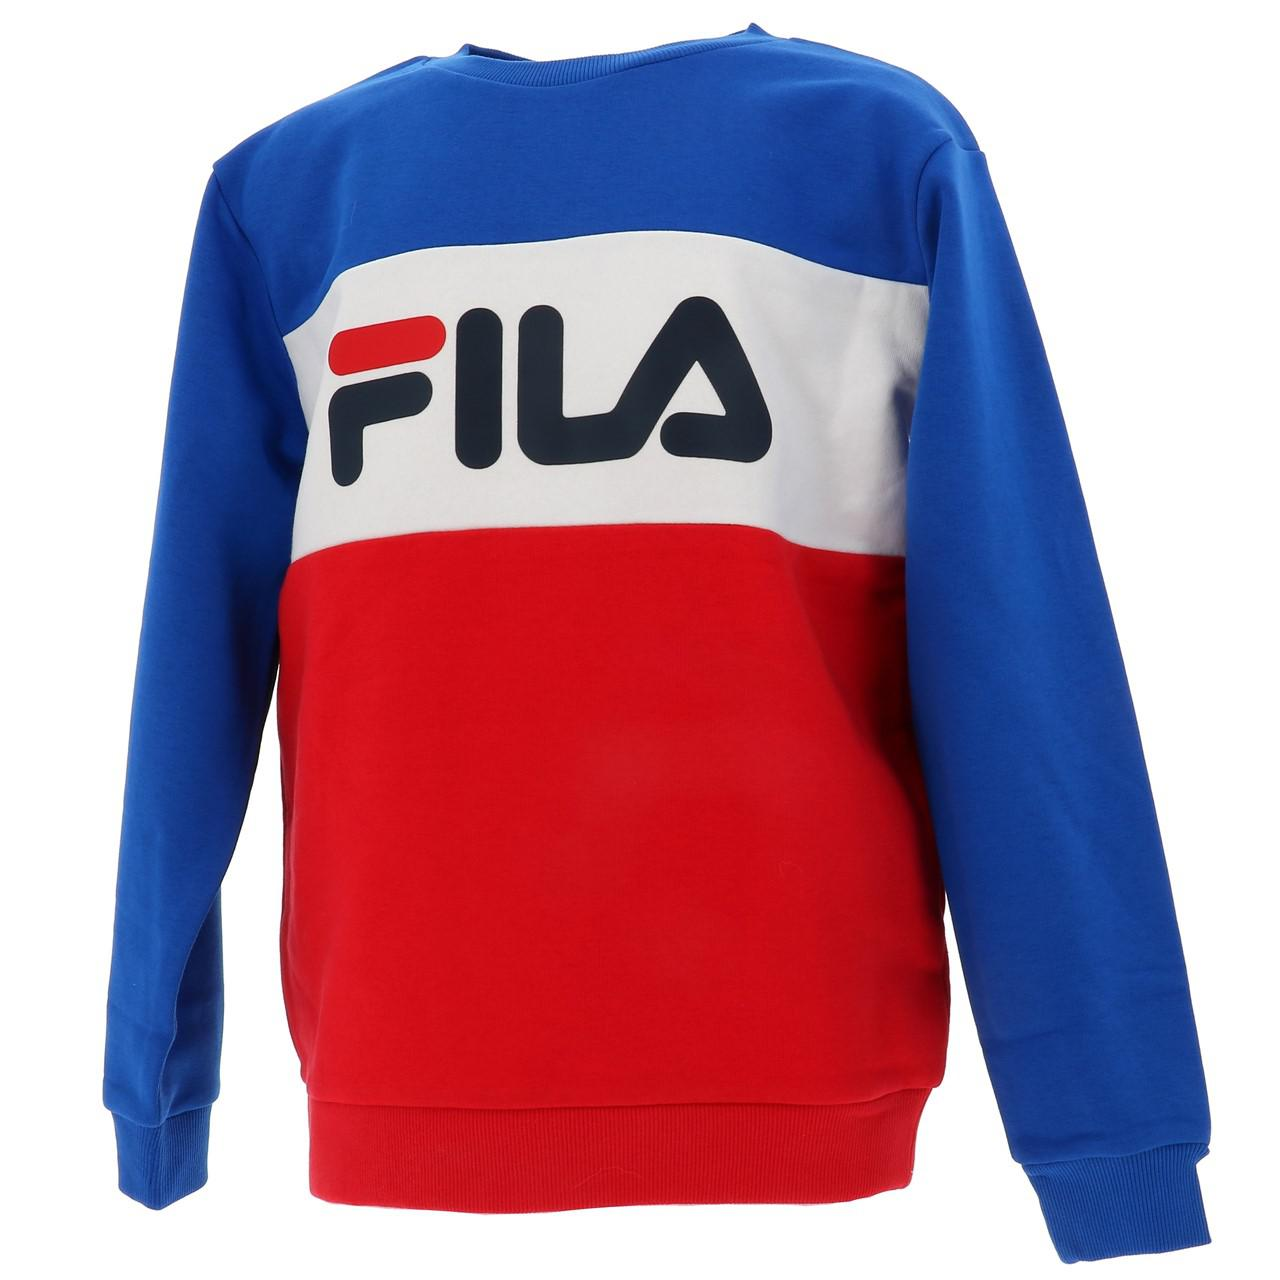 Sweatshirt-Fila-Nacht-Blockiert-Jr-Roy-Rge-Blau-43025-Neu